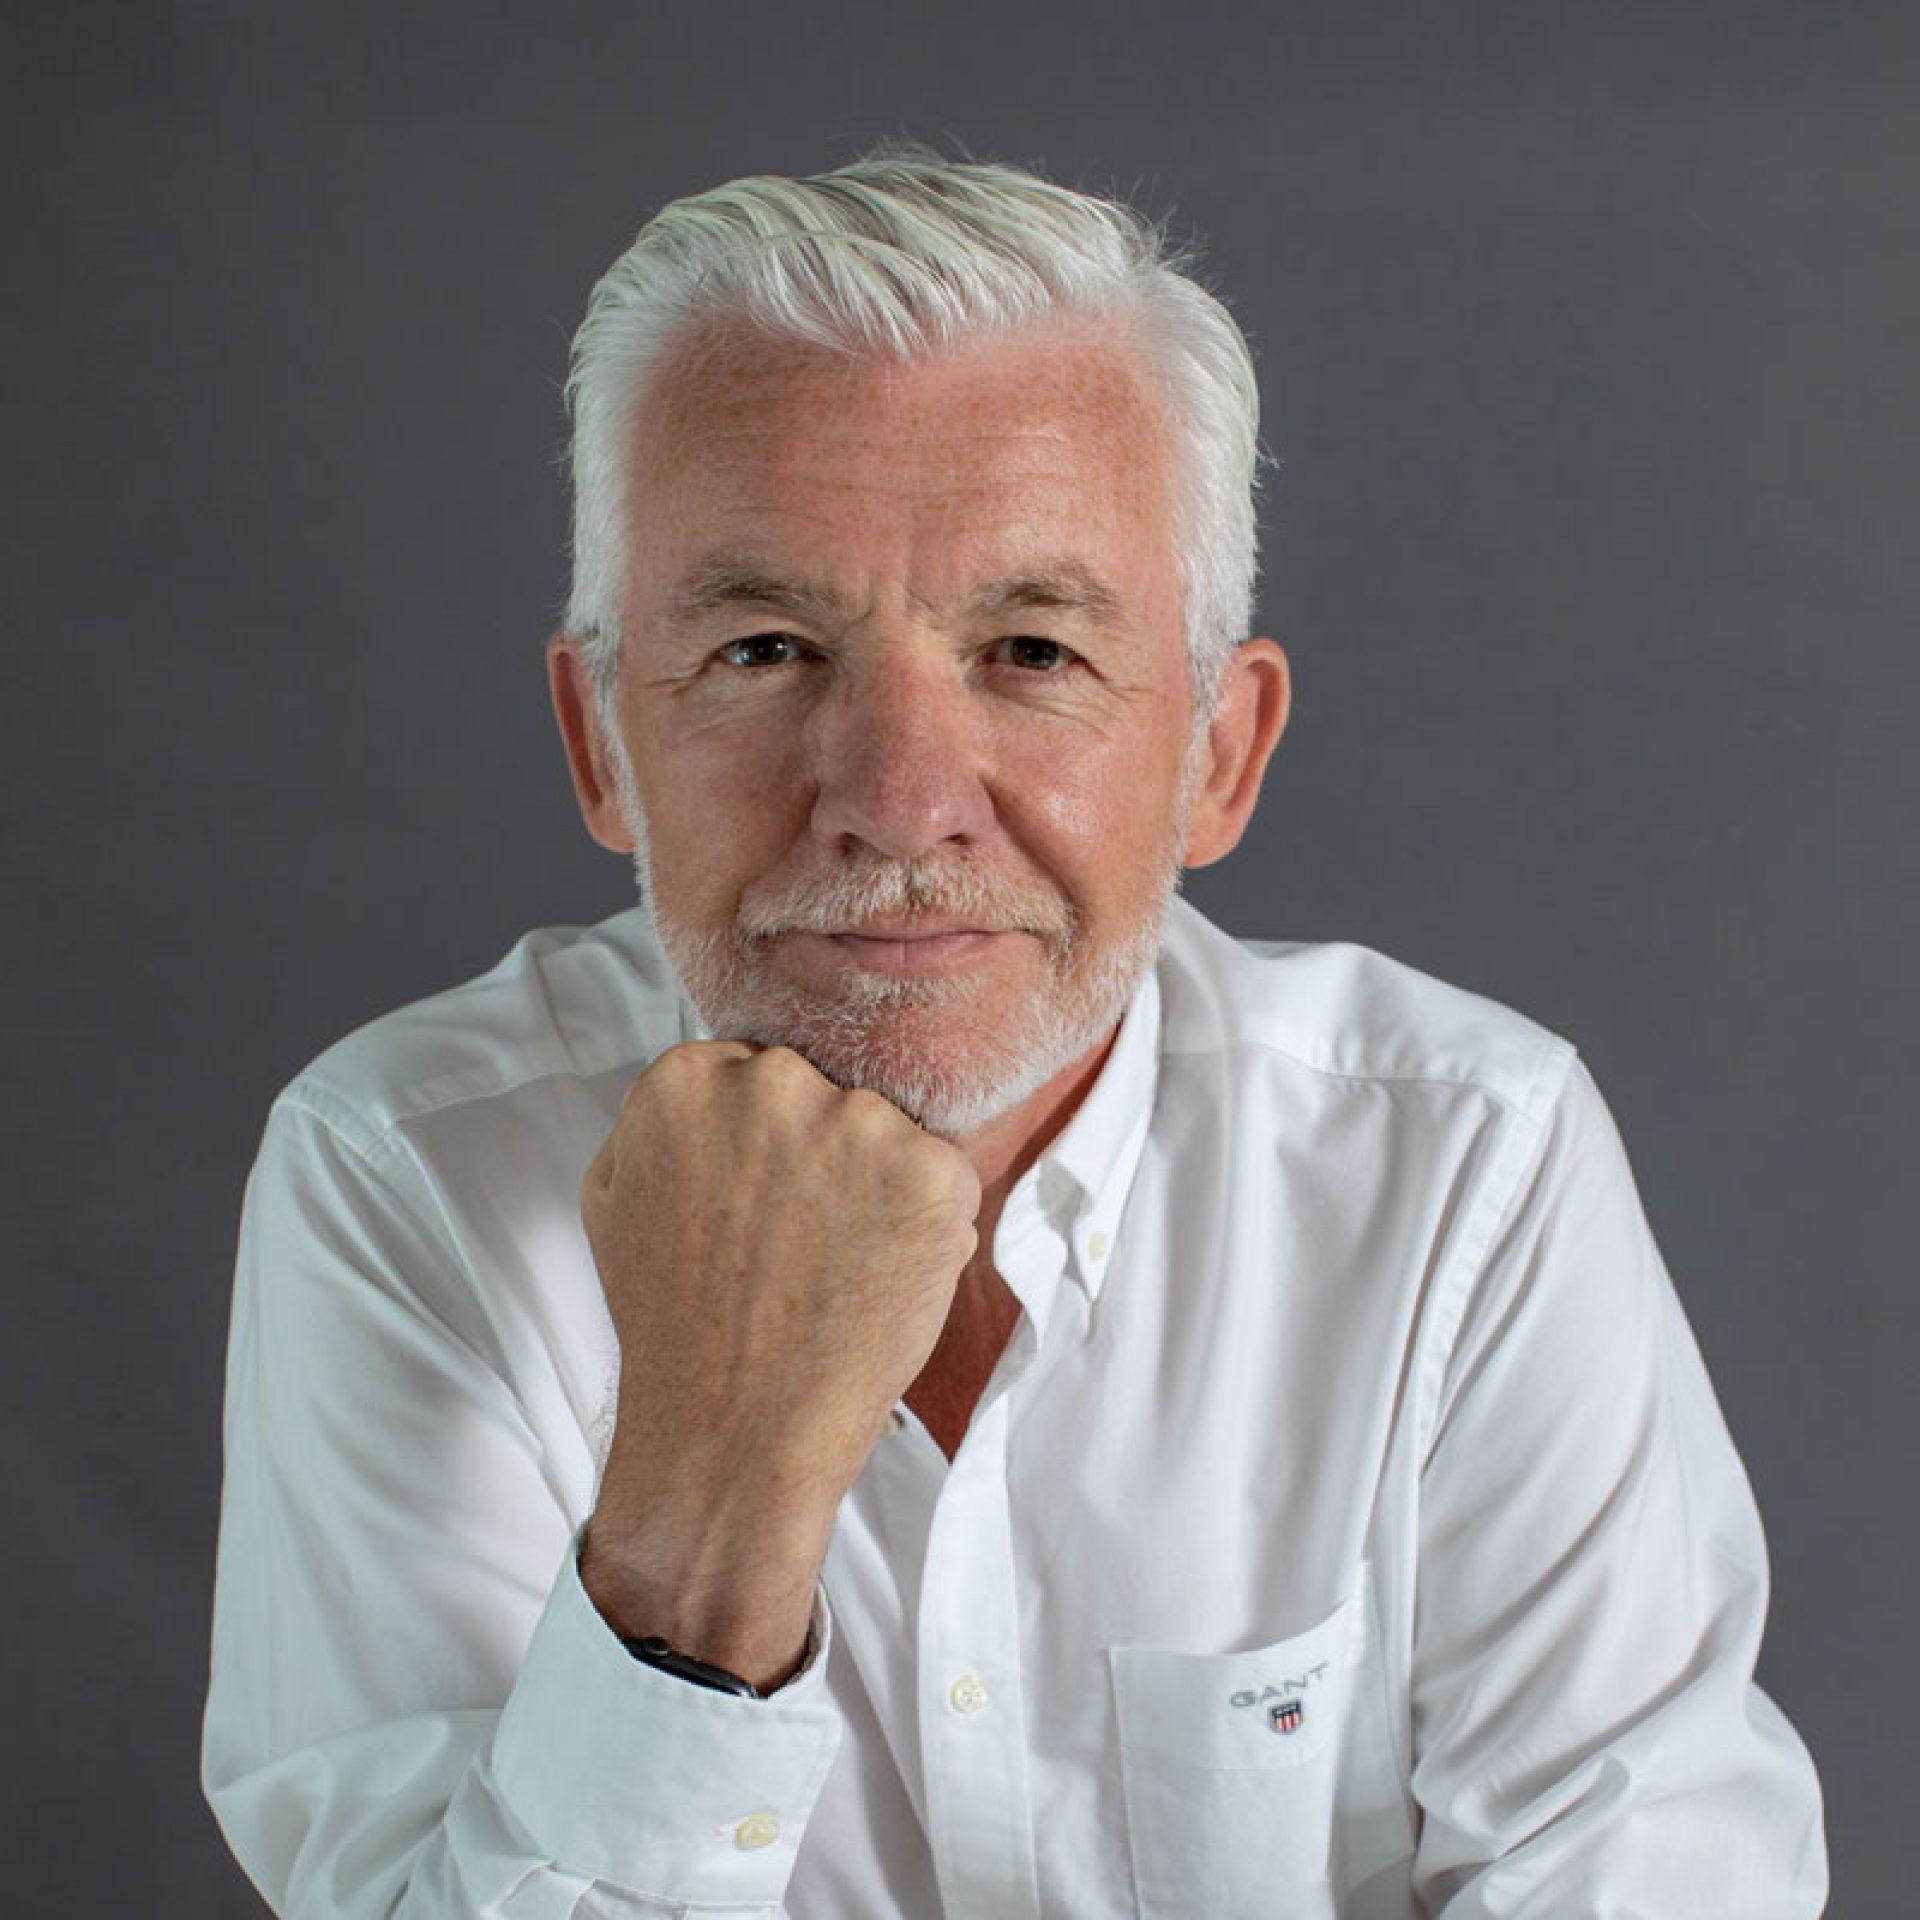 Alan O'Neill Tara Nolan Game Of Teams Podcast